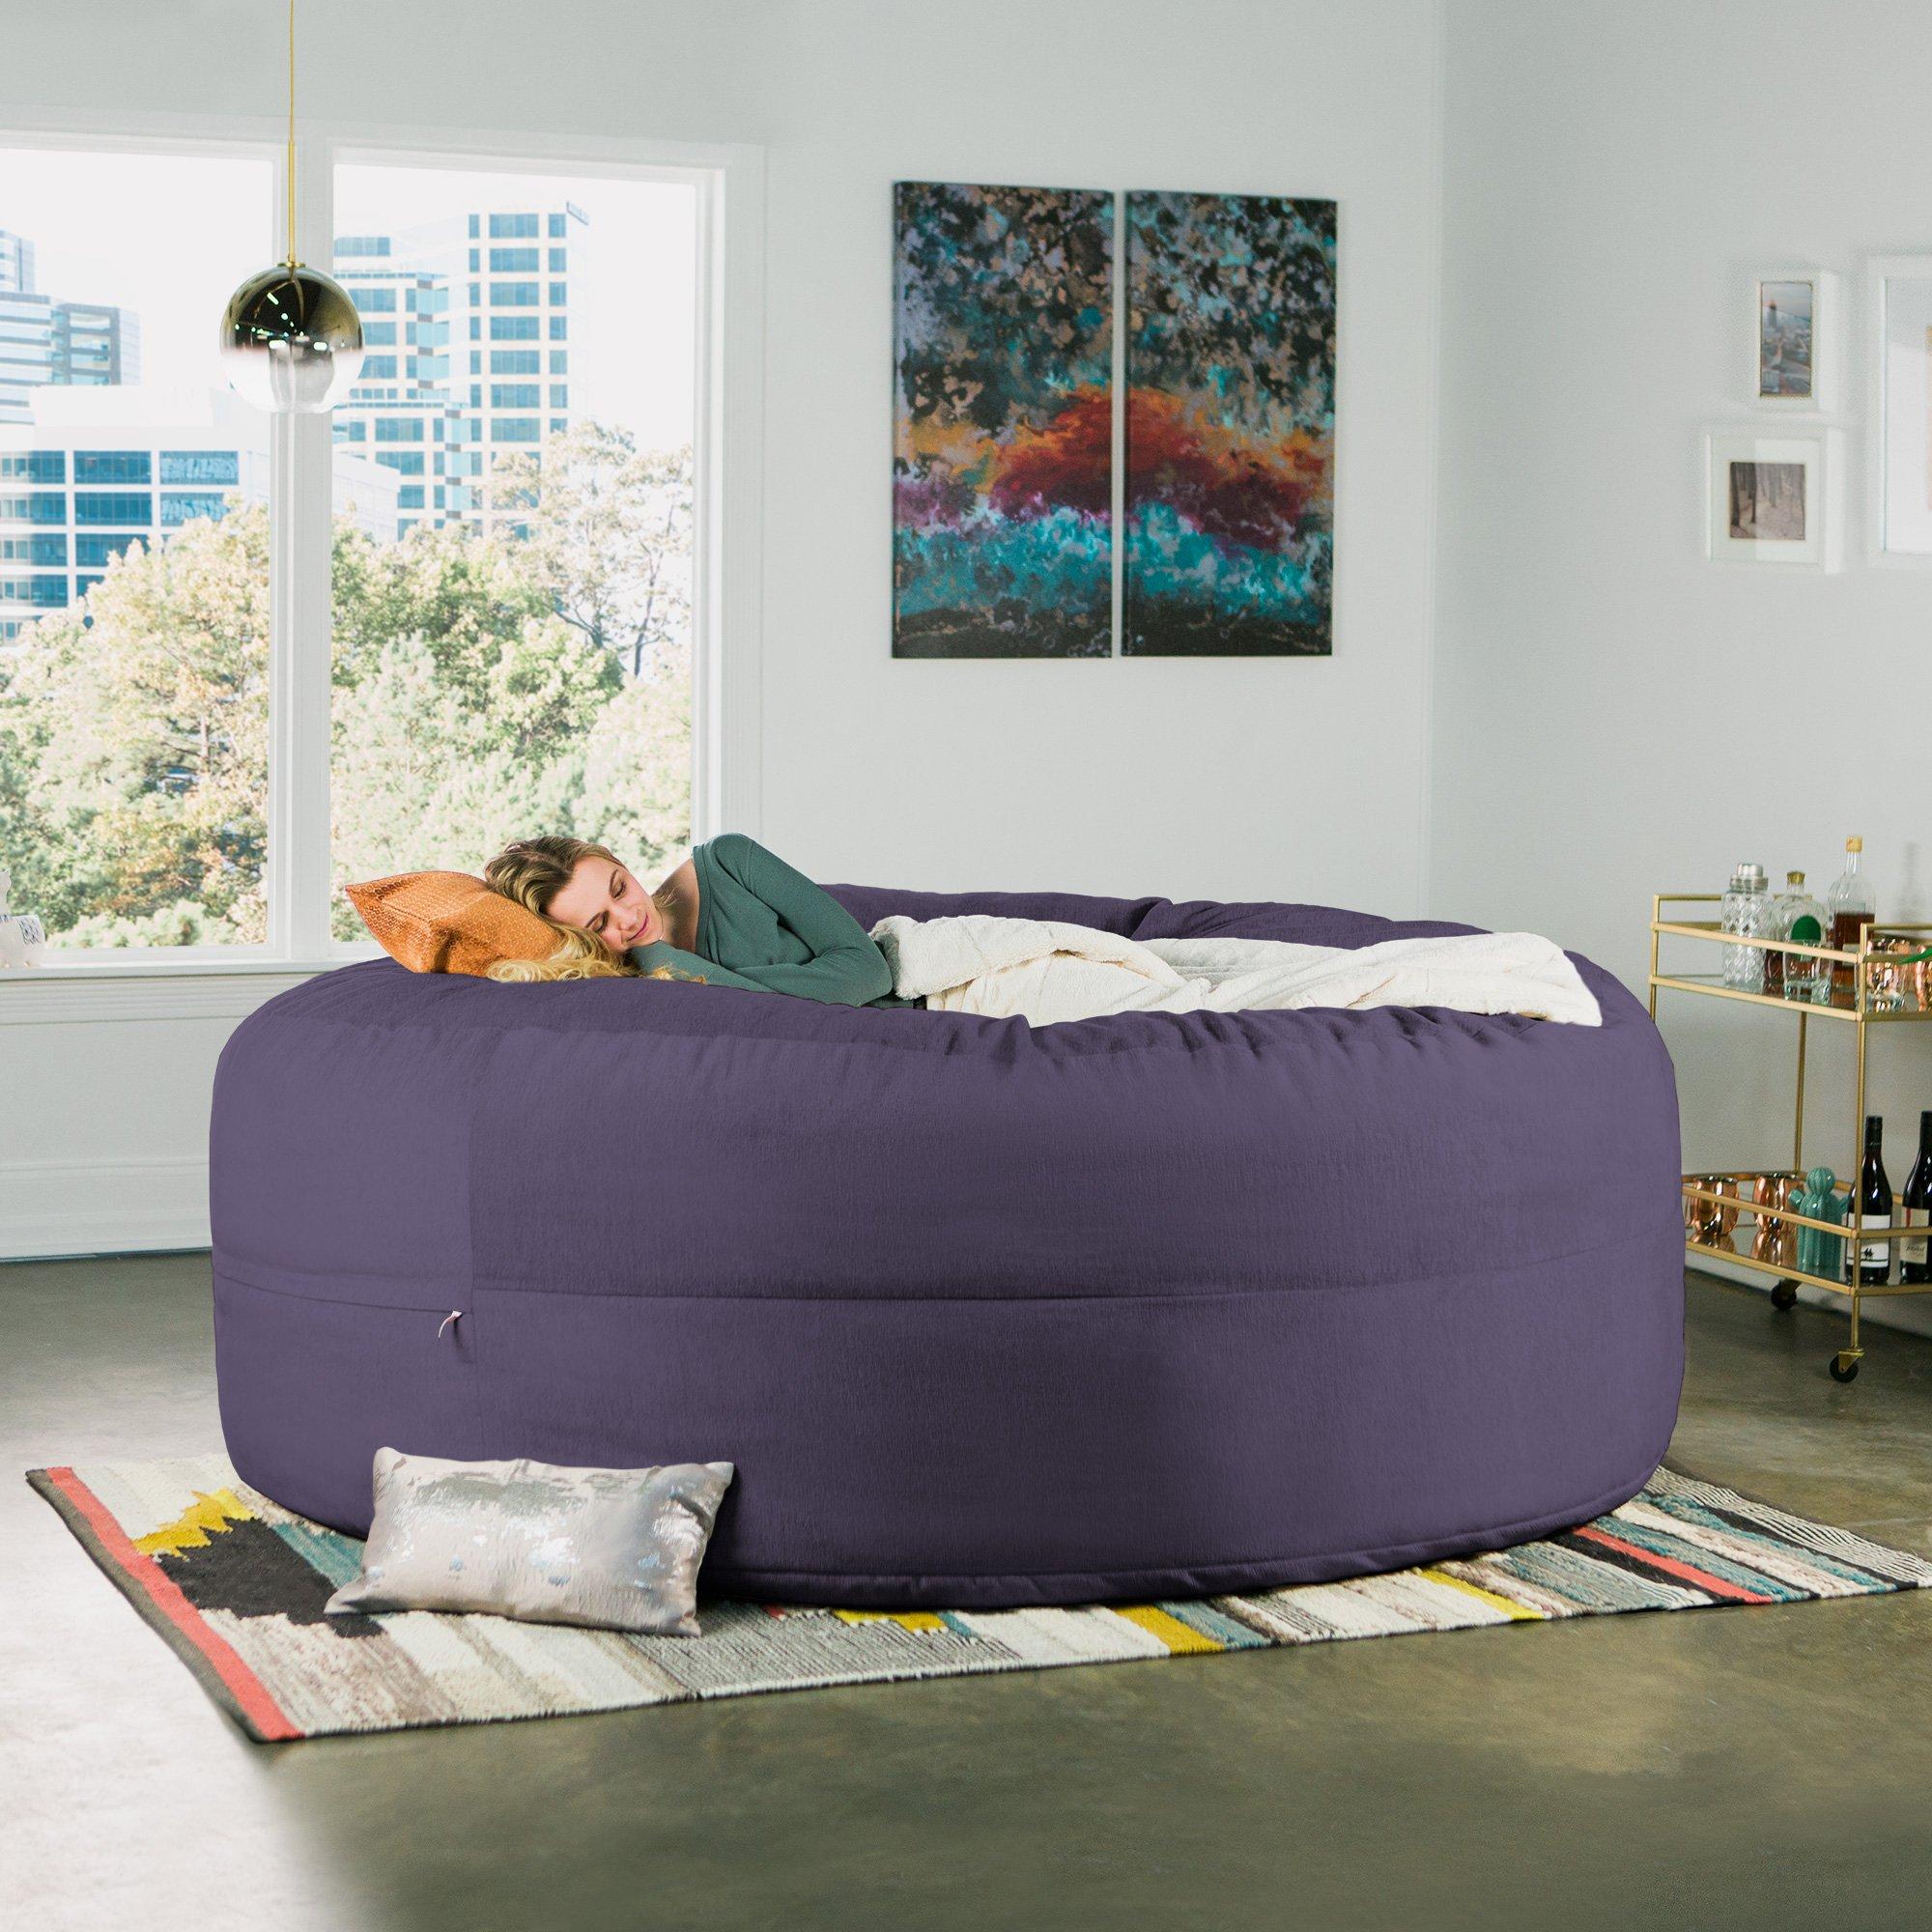 Jaxx Cocoon 8 Foot Huge Sleeper Bean Bag Bed - Chenille, Plum by Jaxx (Image #7)